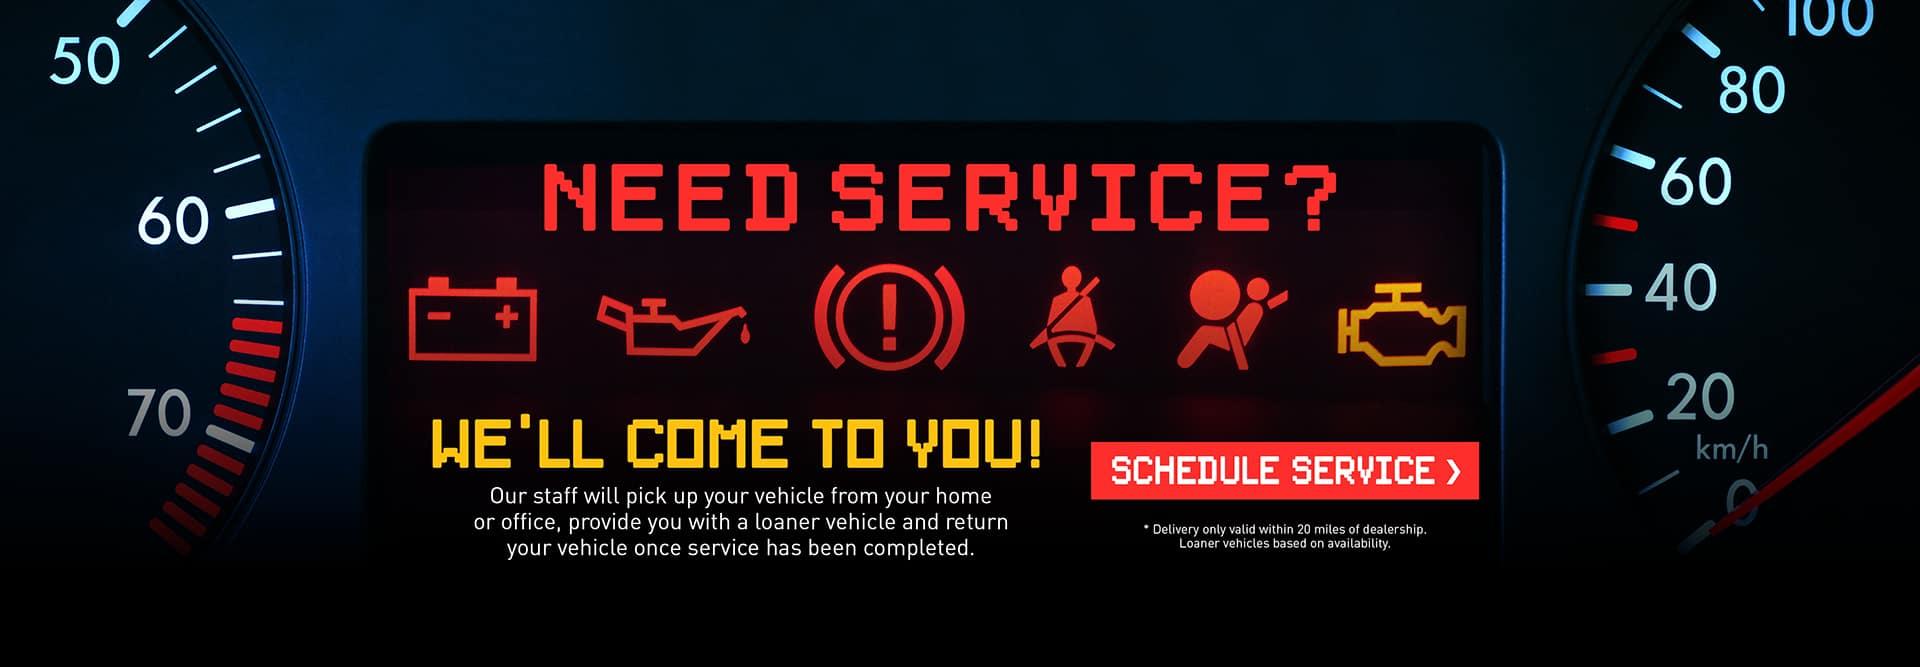 Need Service?